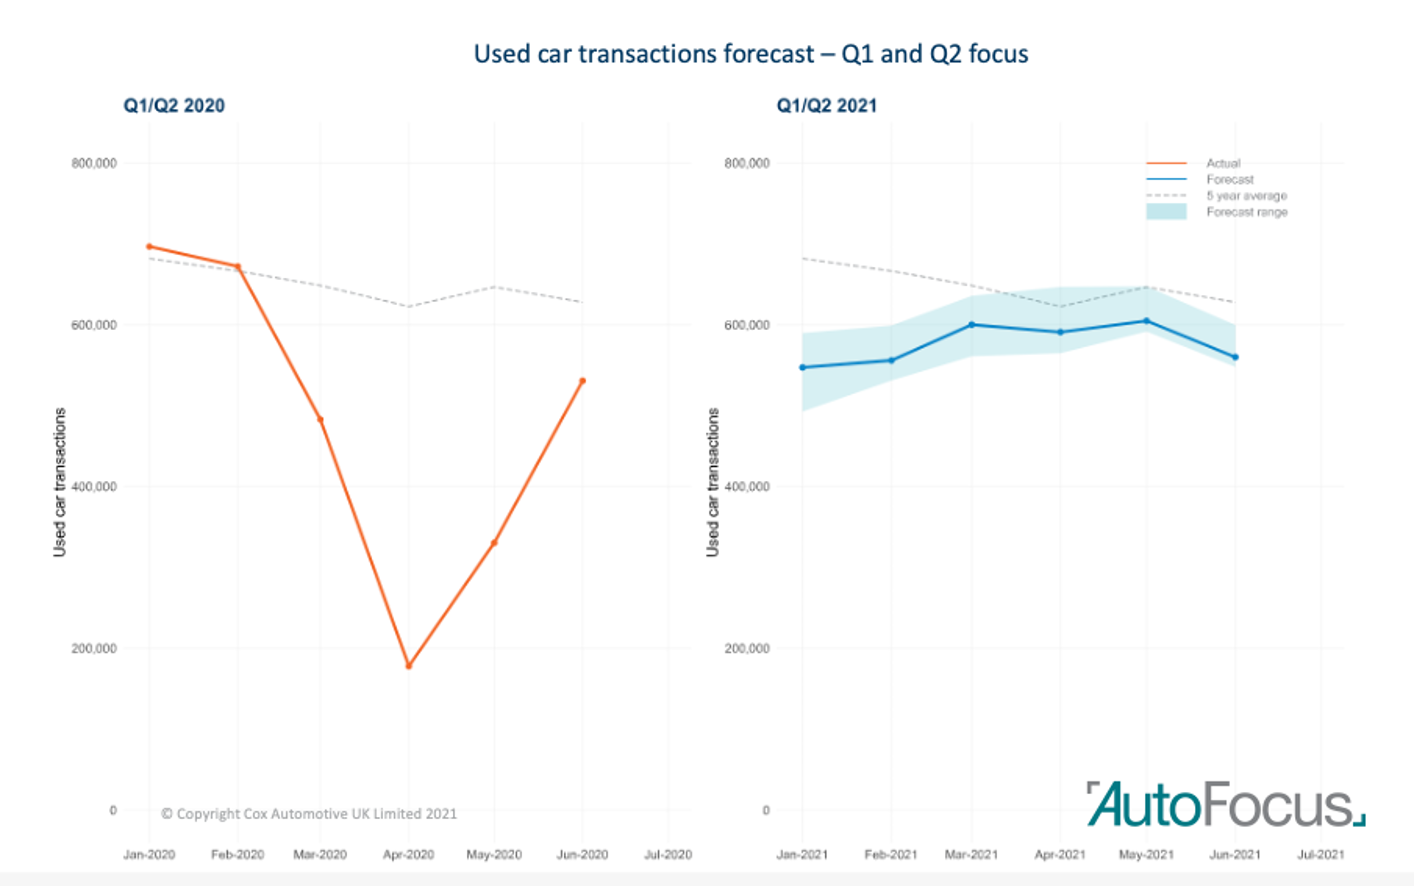 Cox Automotive's used car transaction forcast data: